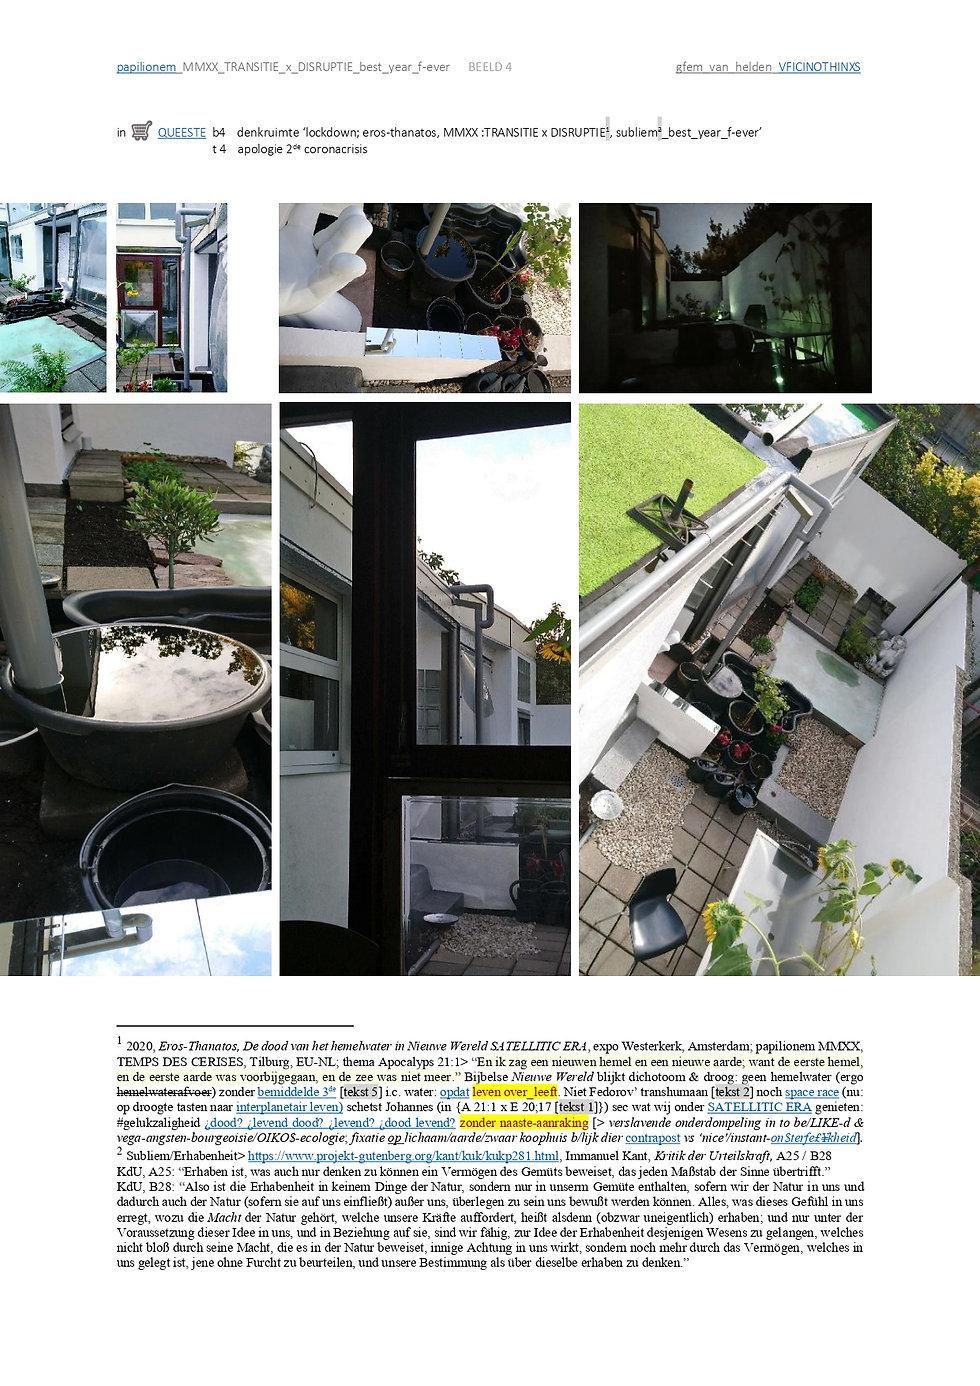 8 papilionem beeld 4_page-0001.jpg